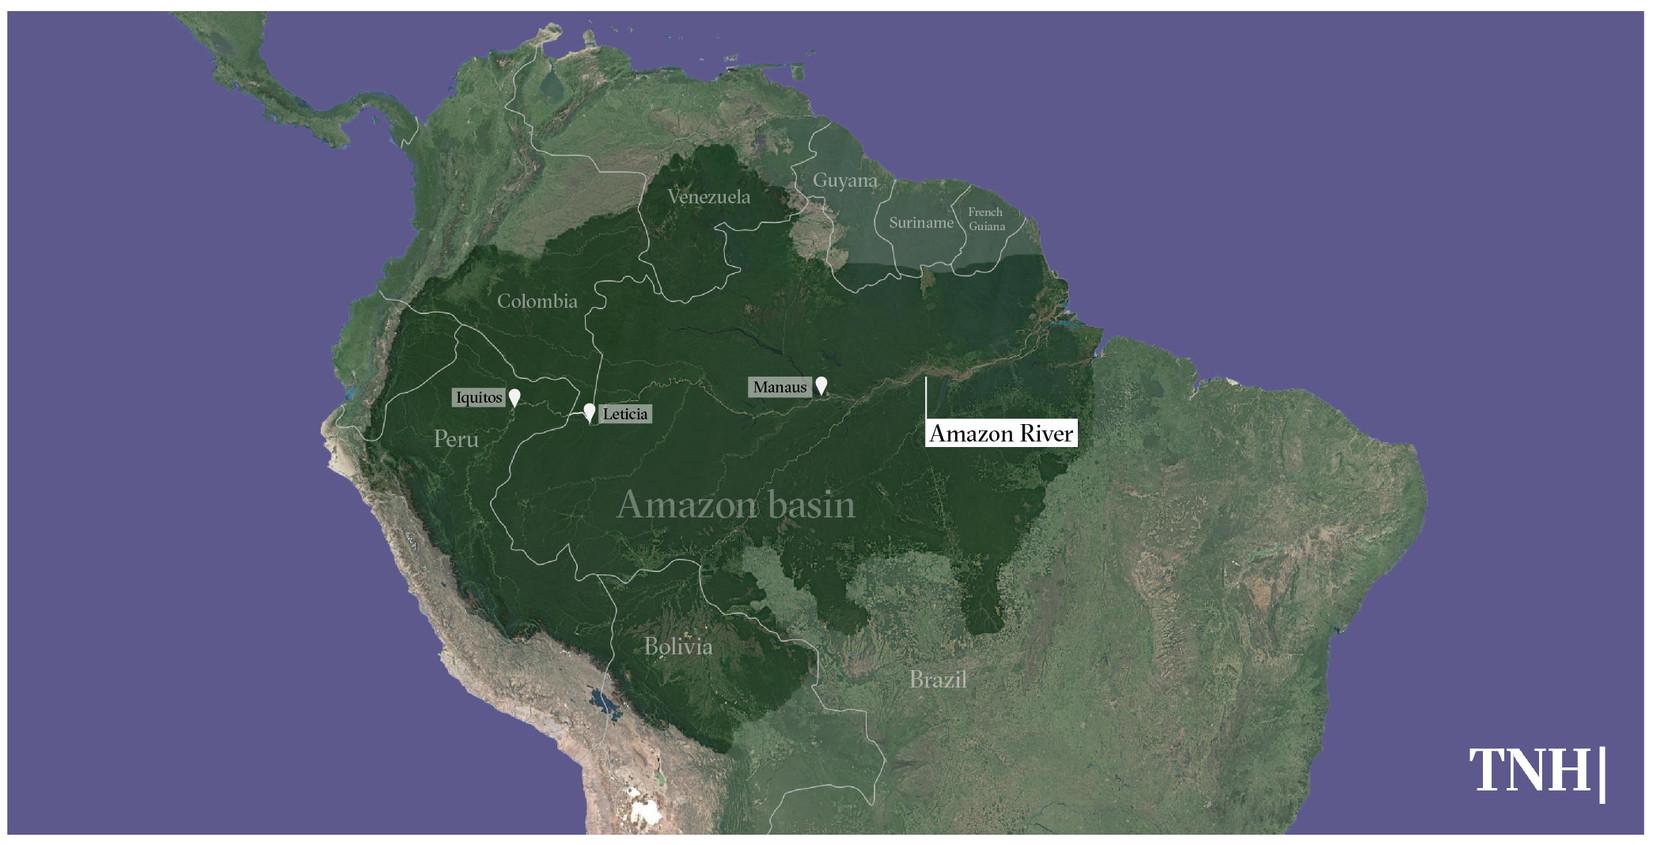 Map of the Amazon region